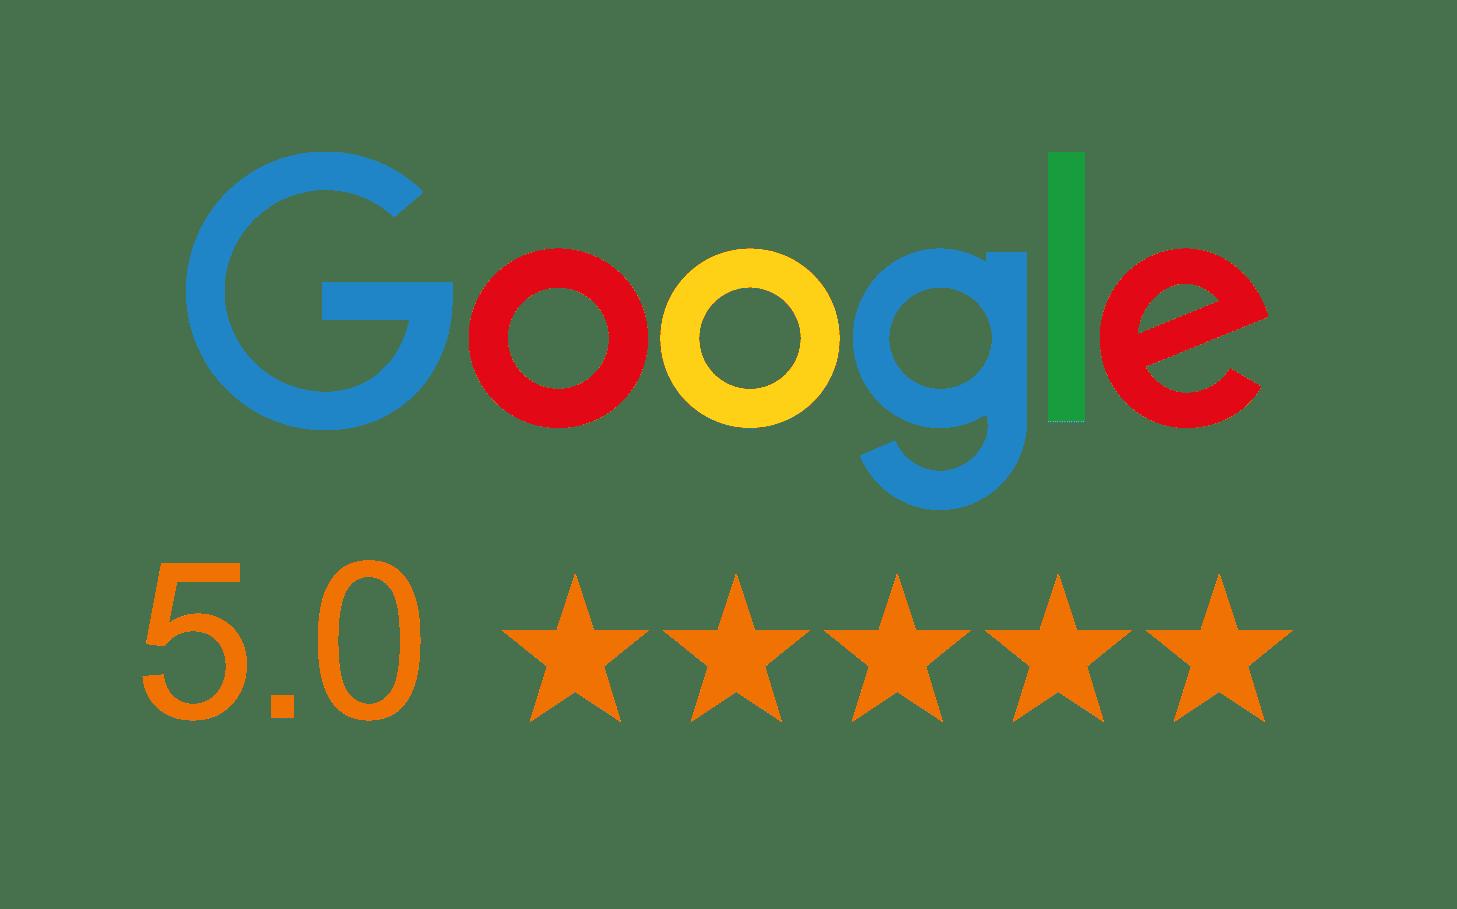 Google 5 star logo